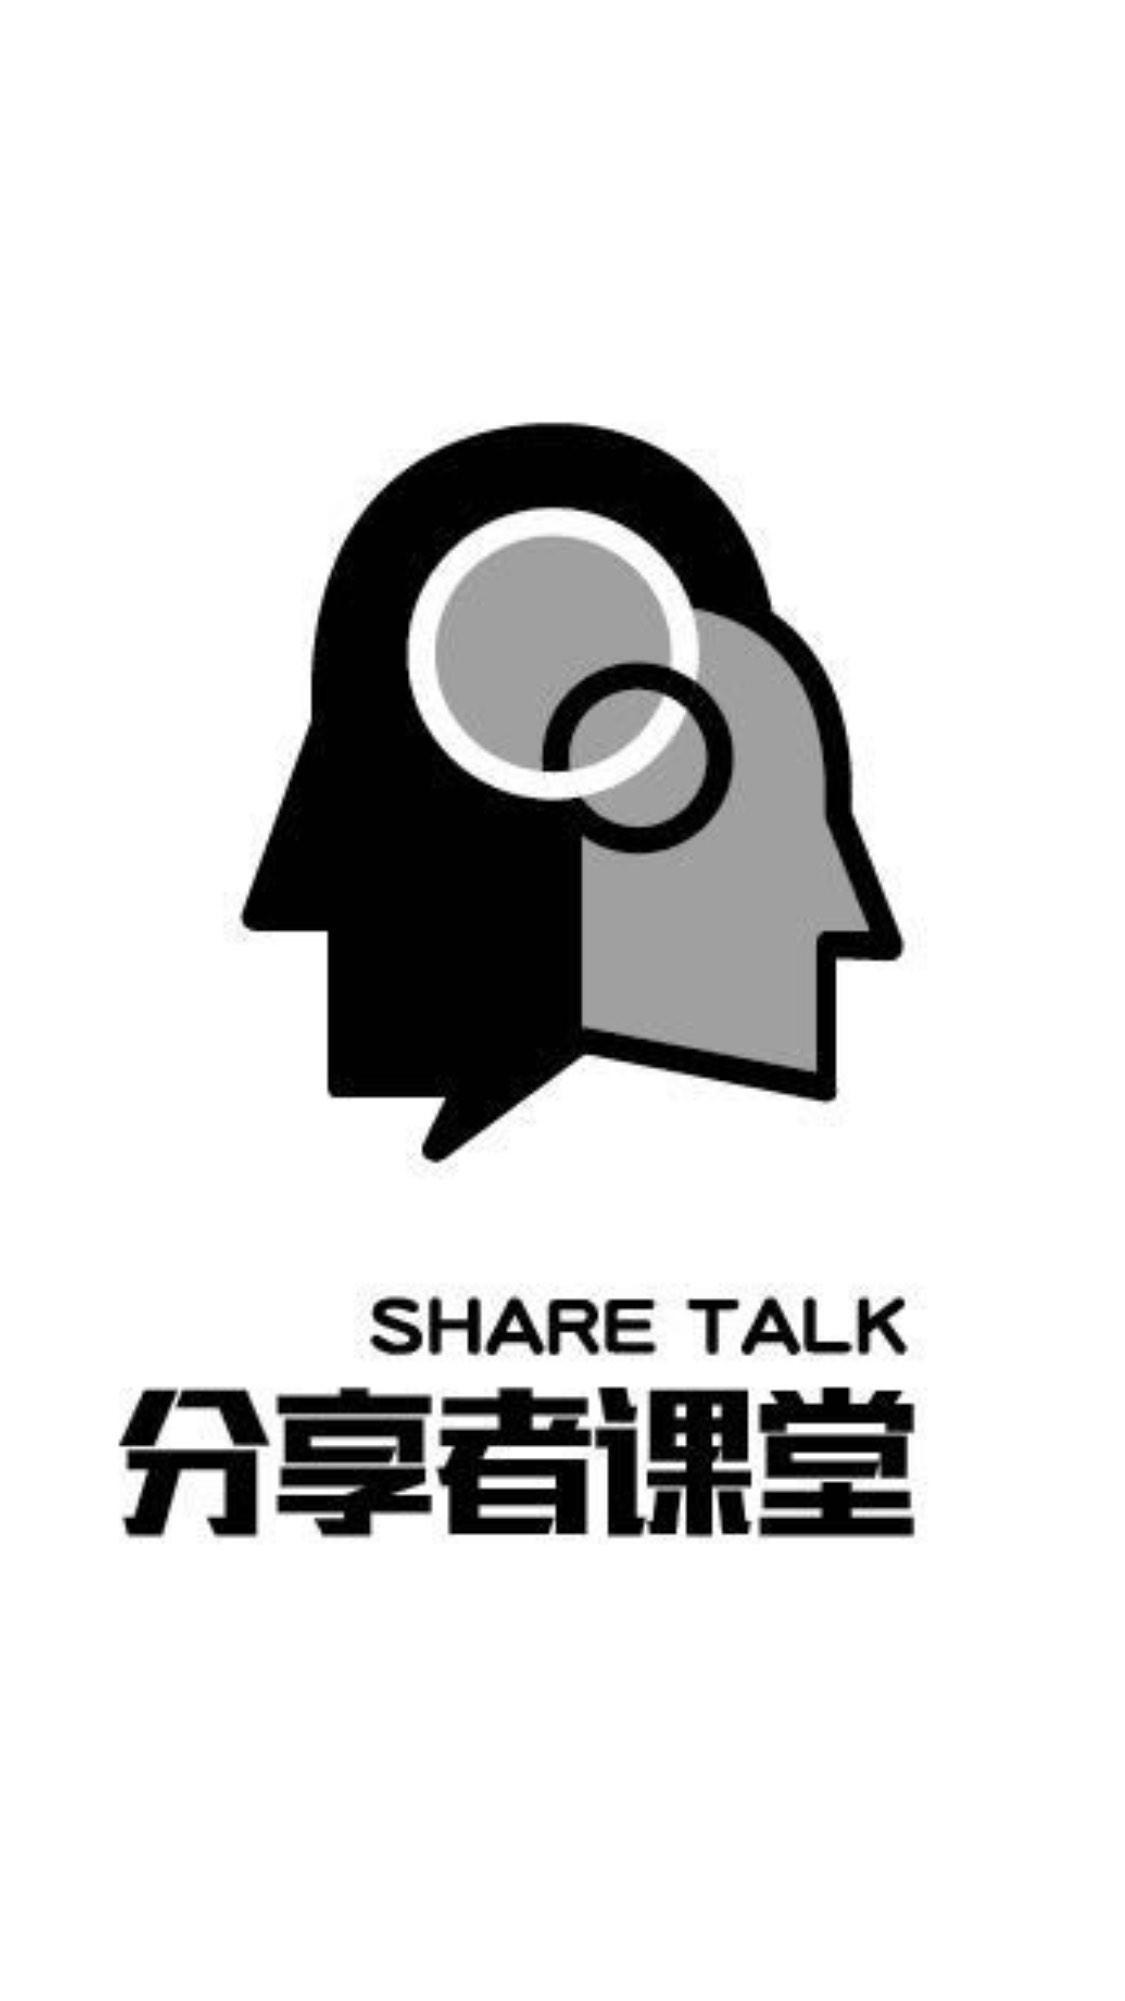 logo logo 标志 设计 矢量 矢量图 素材 图标 1125_2001 竖版 竖屏